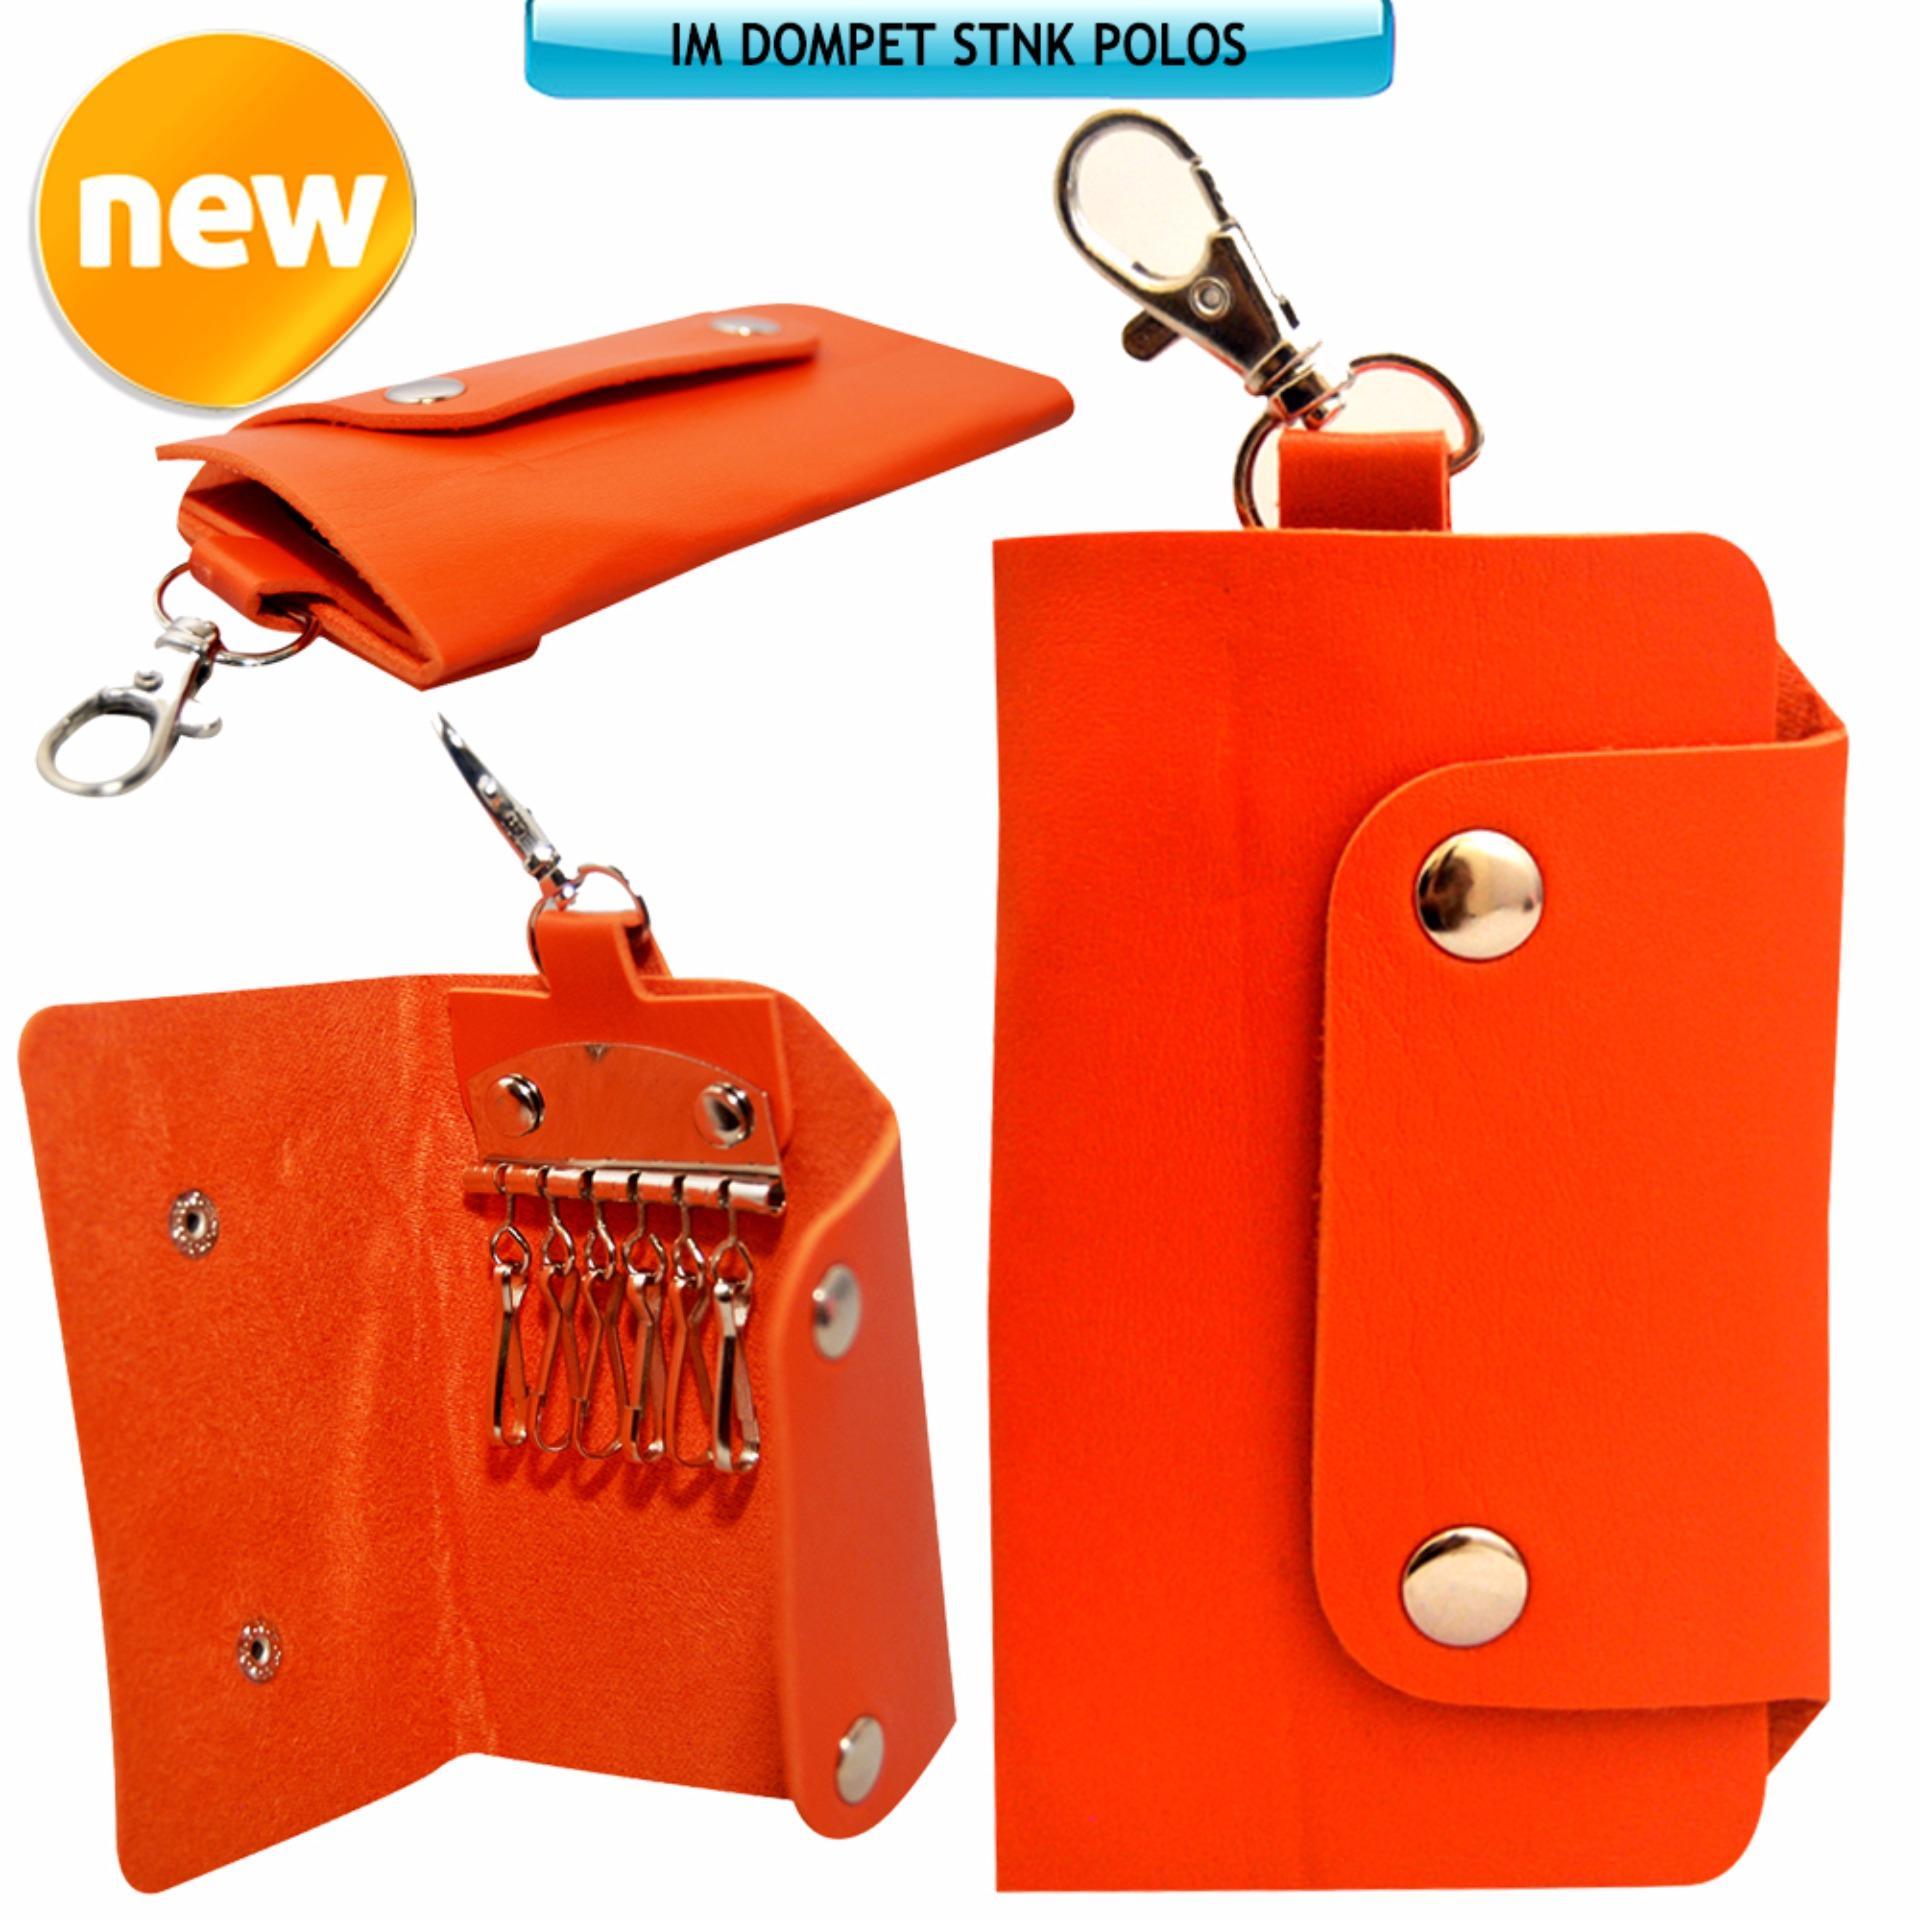 Autorace Dompet / Gantungan Kunci Mobil Motor Polos - Orange